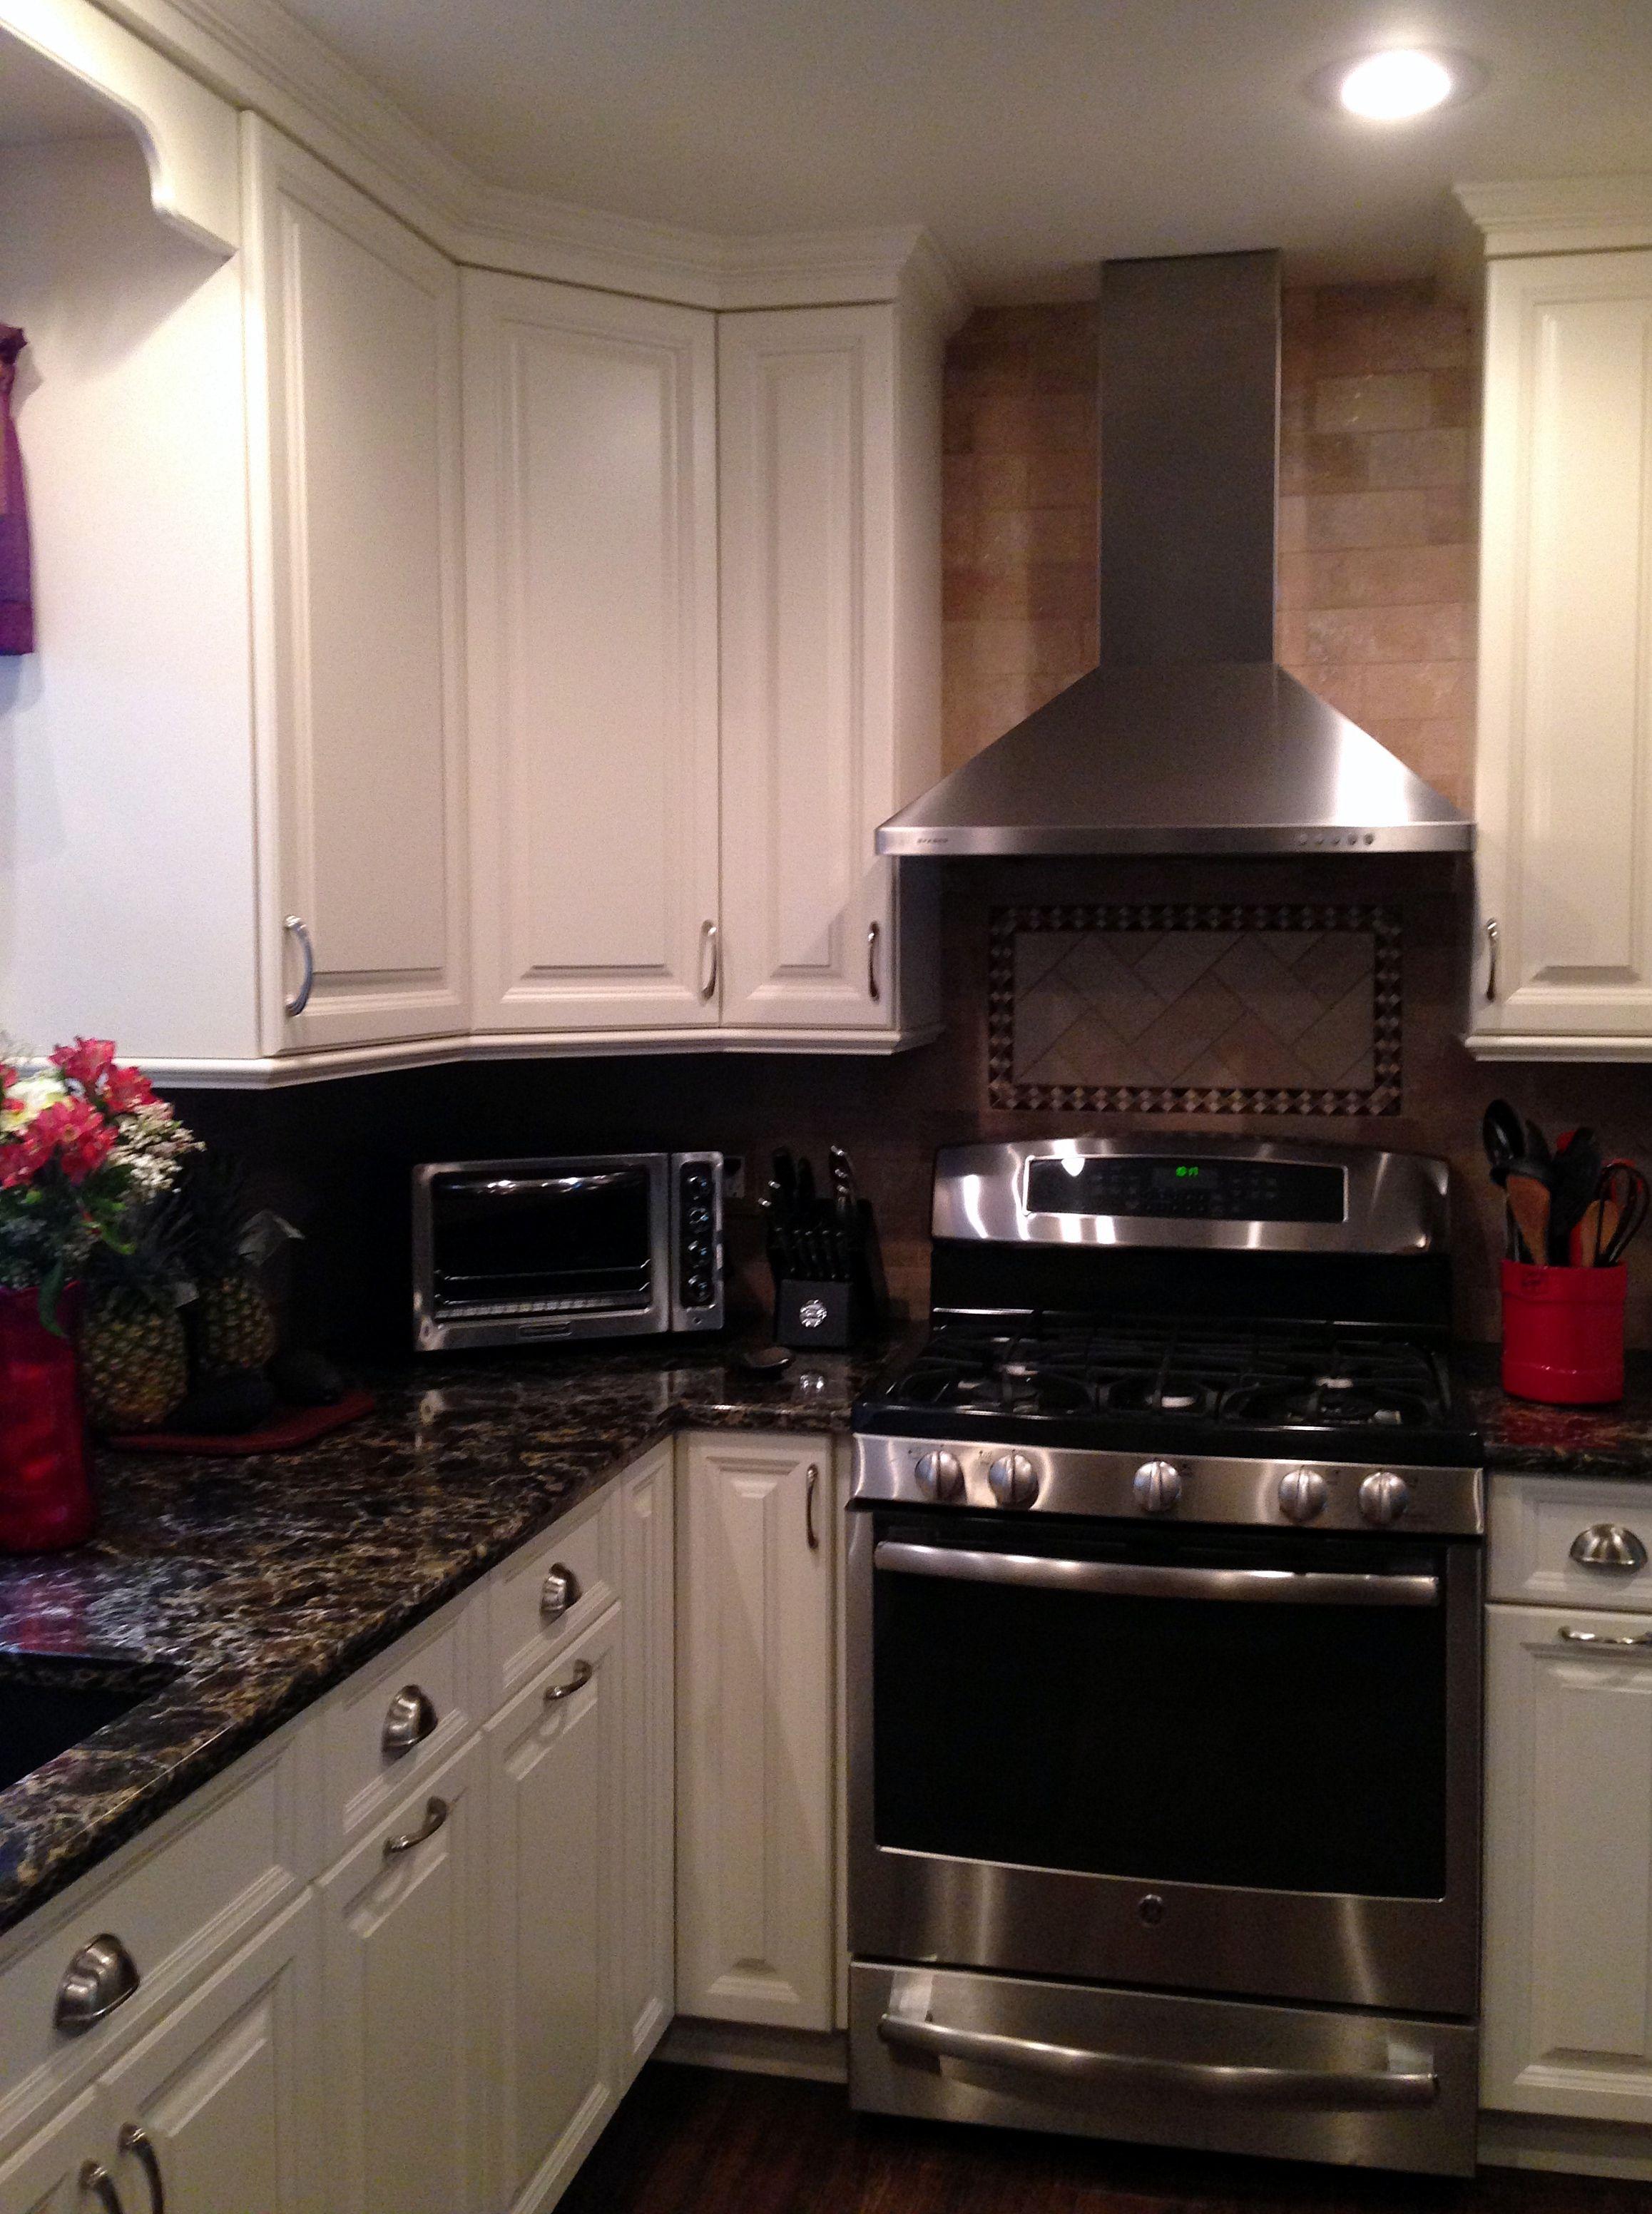 White Millbrook Kitchen With Laneshaw Quartz Countertops 6 Of 10 Kitchen Countertops Quartz Countertops